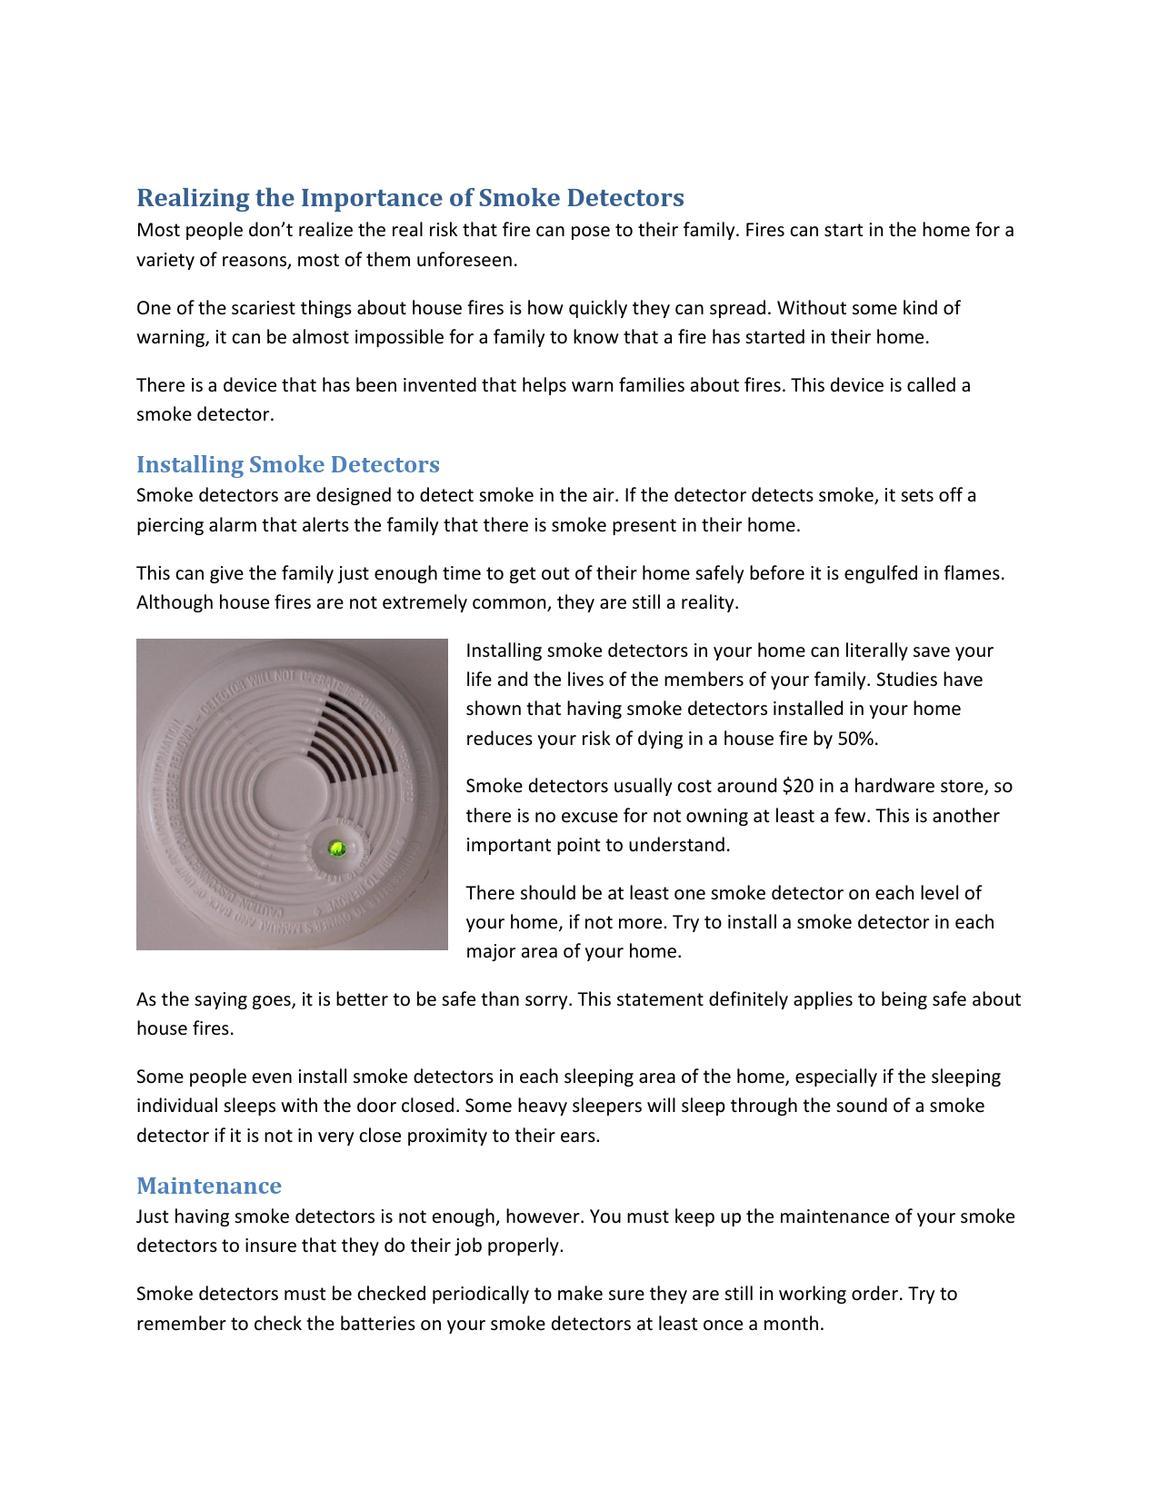 Realizing The Importance Of Smoke Detectors By Jimmy John Issuu